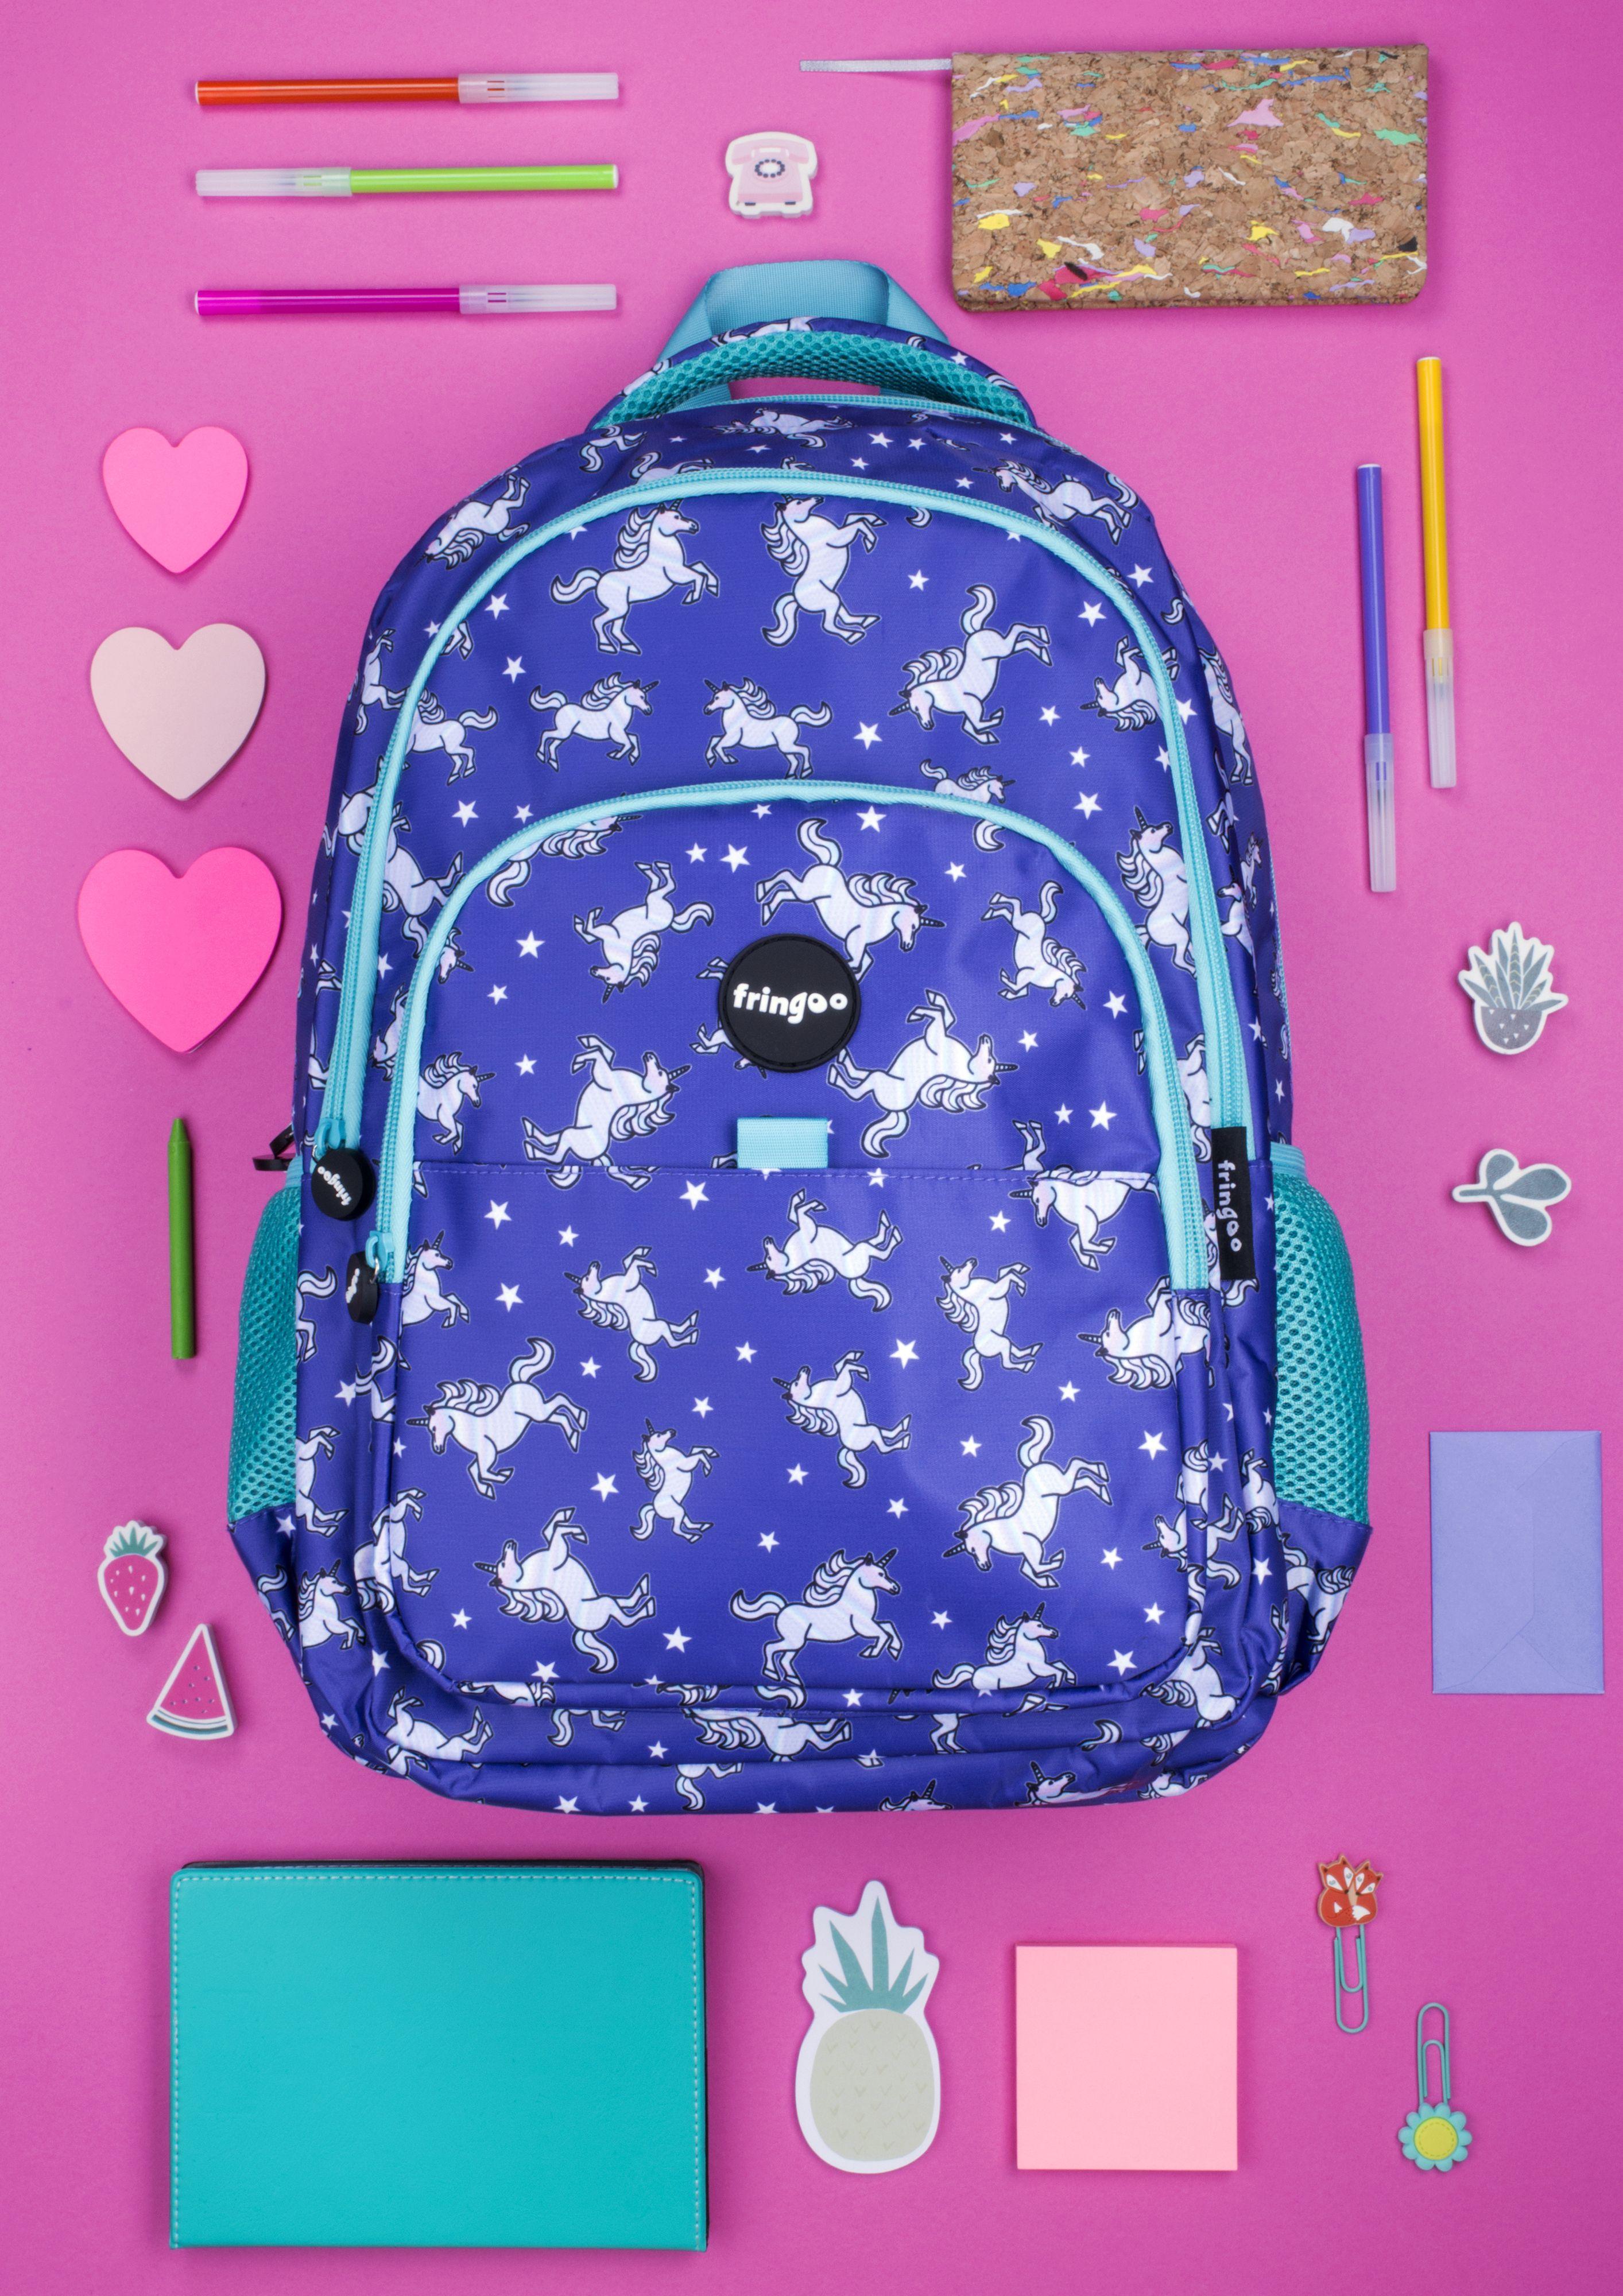 b2ecc76306cc Unicorn backpack for girls. Imaginative unicorn patterned rucksack for kids  and teenagers. Amazing back to school gift.